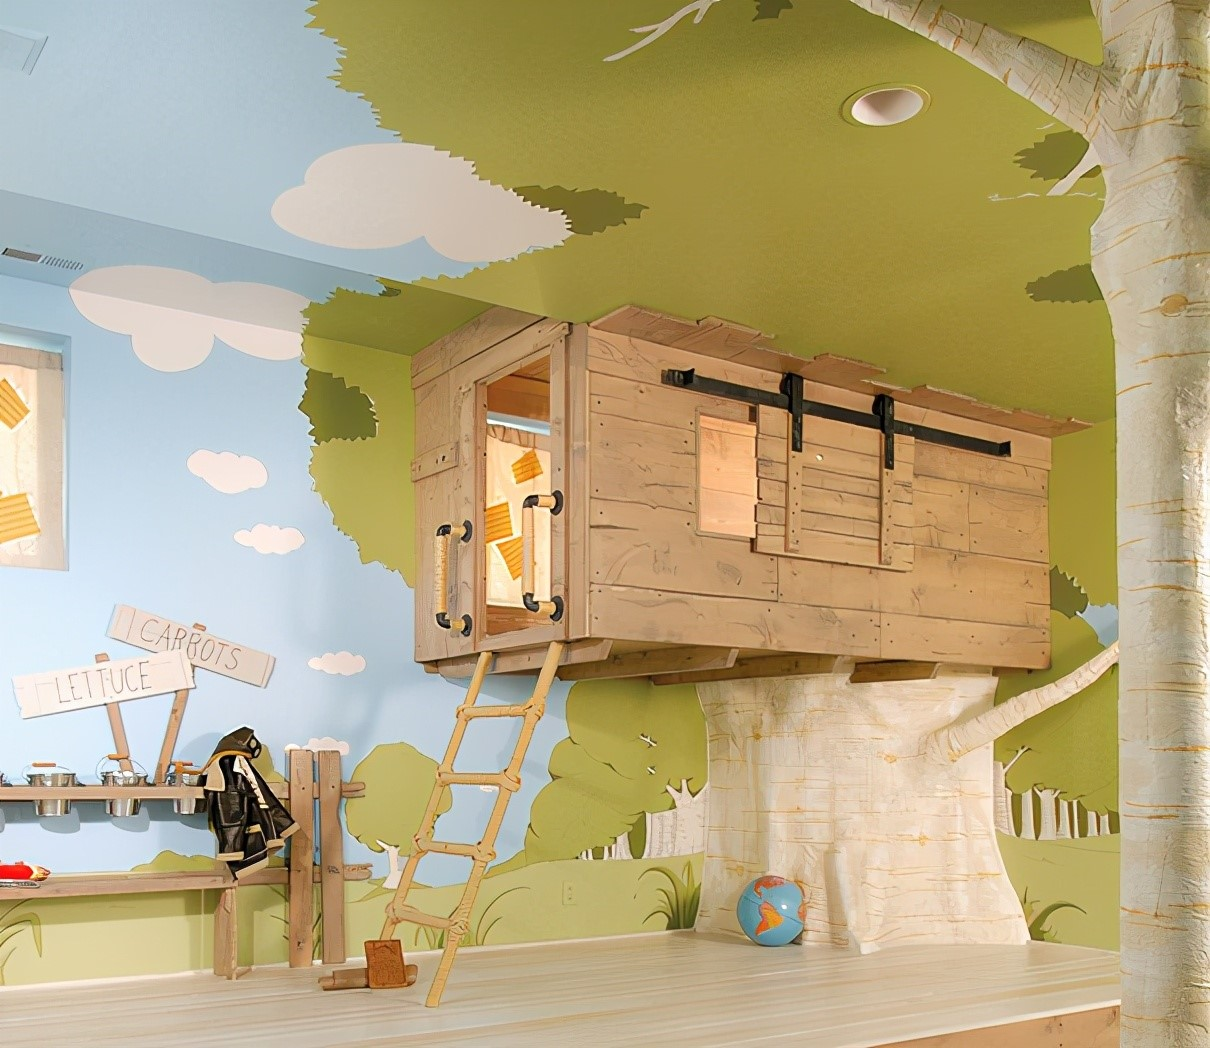 طراحی دیوار اتاق کودک